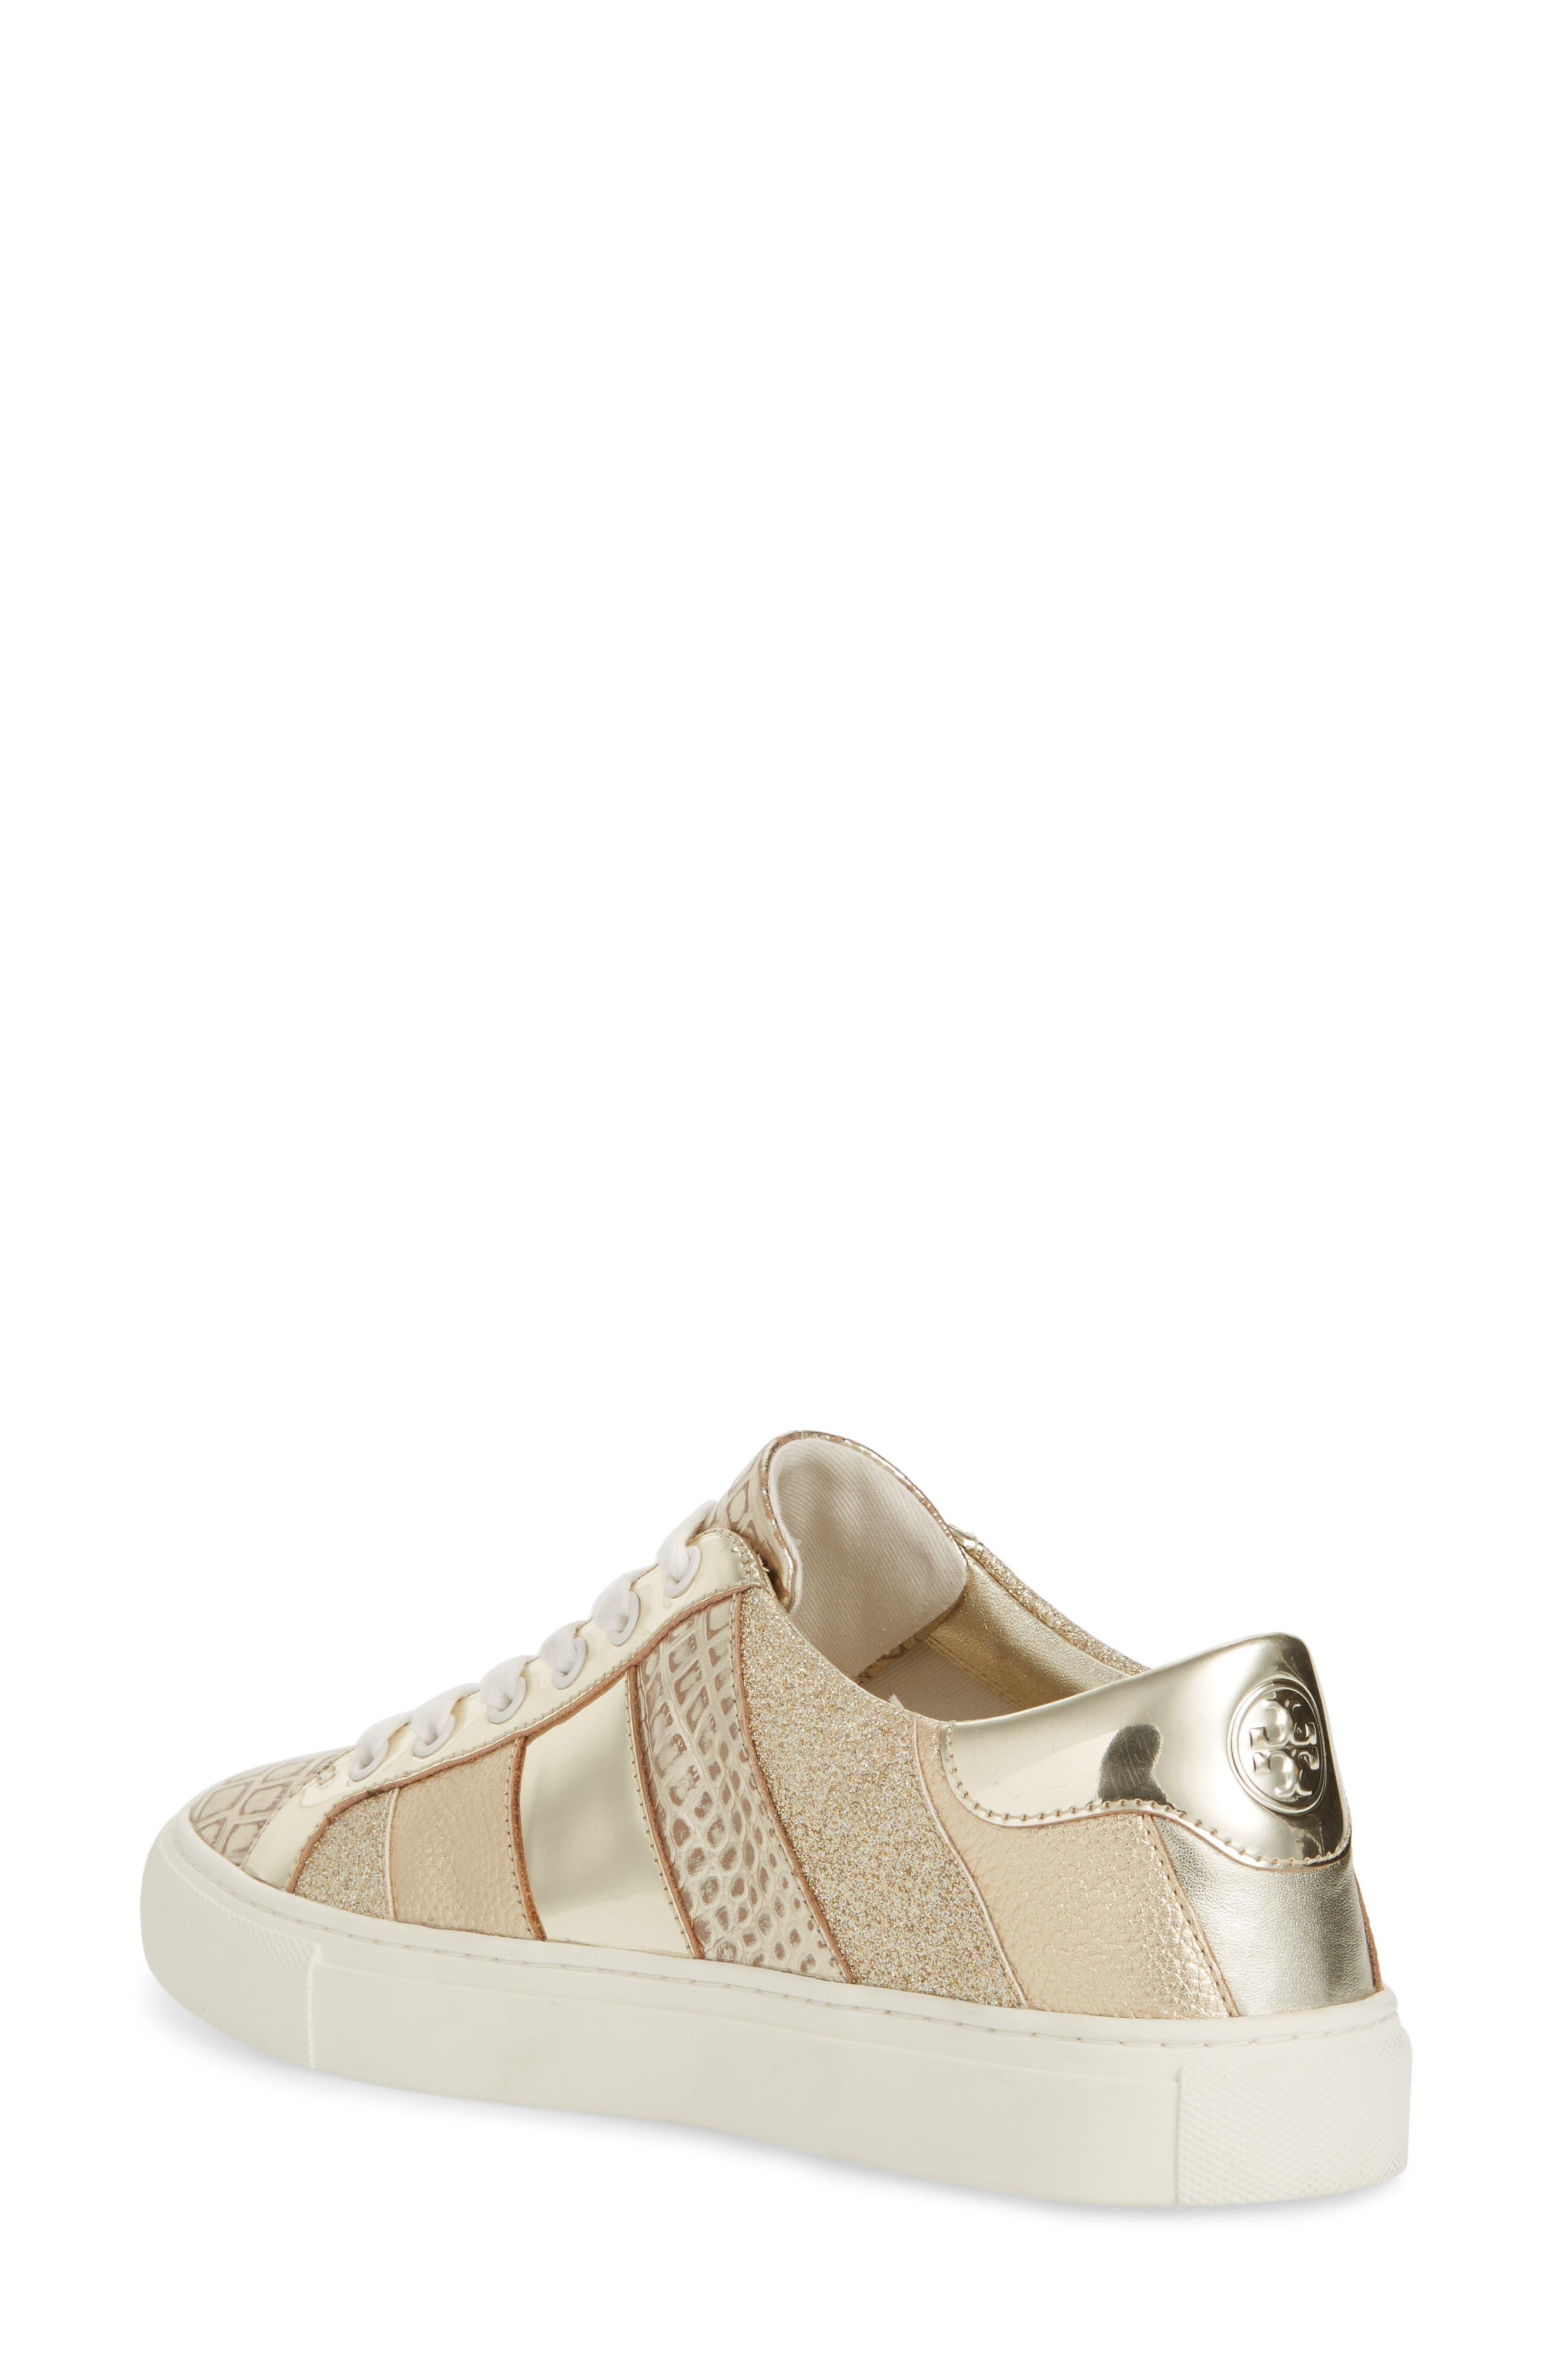 Ames Sneaker,                             Alternate thumbnail 2, color,                             723